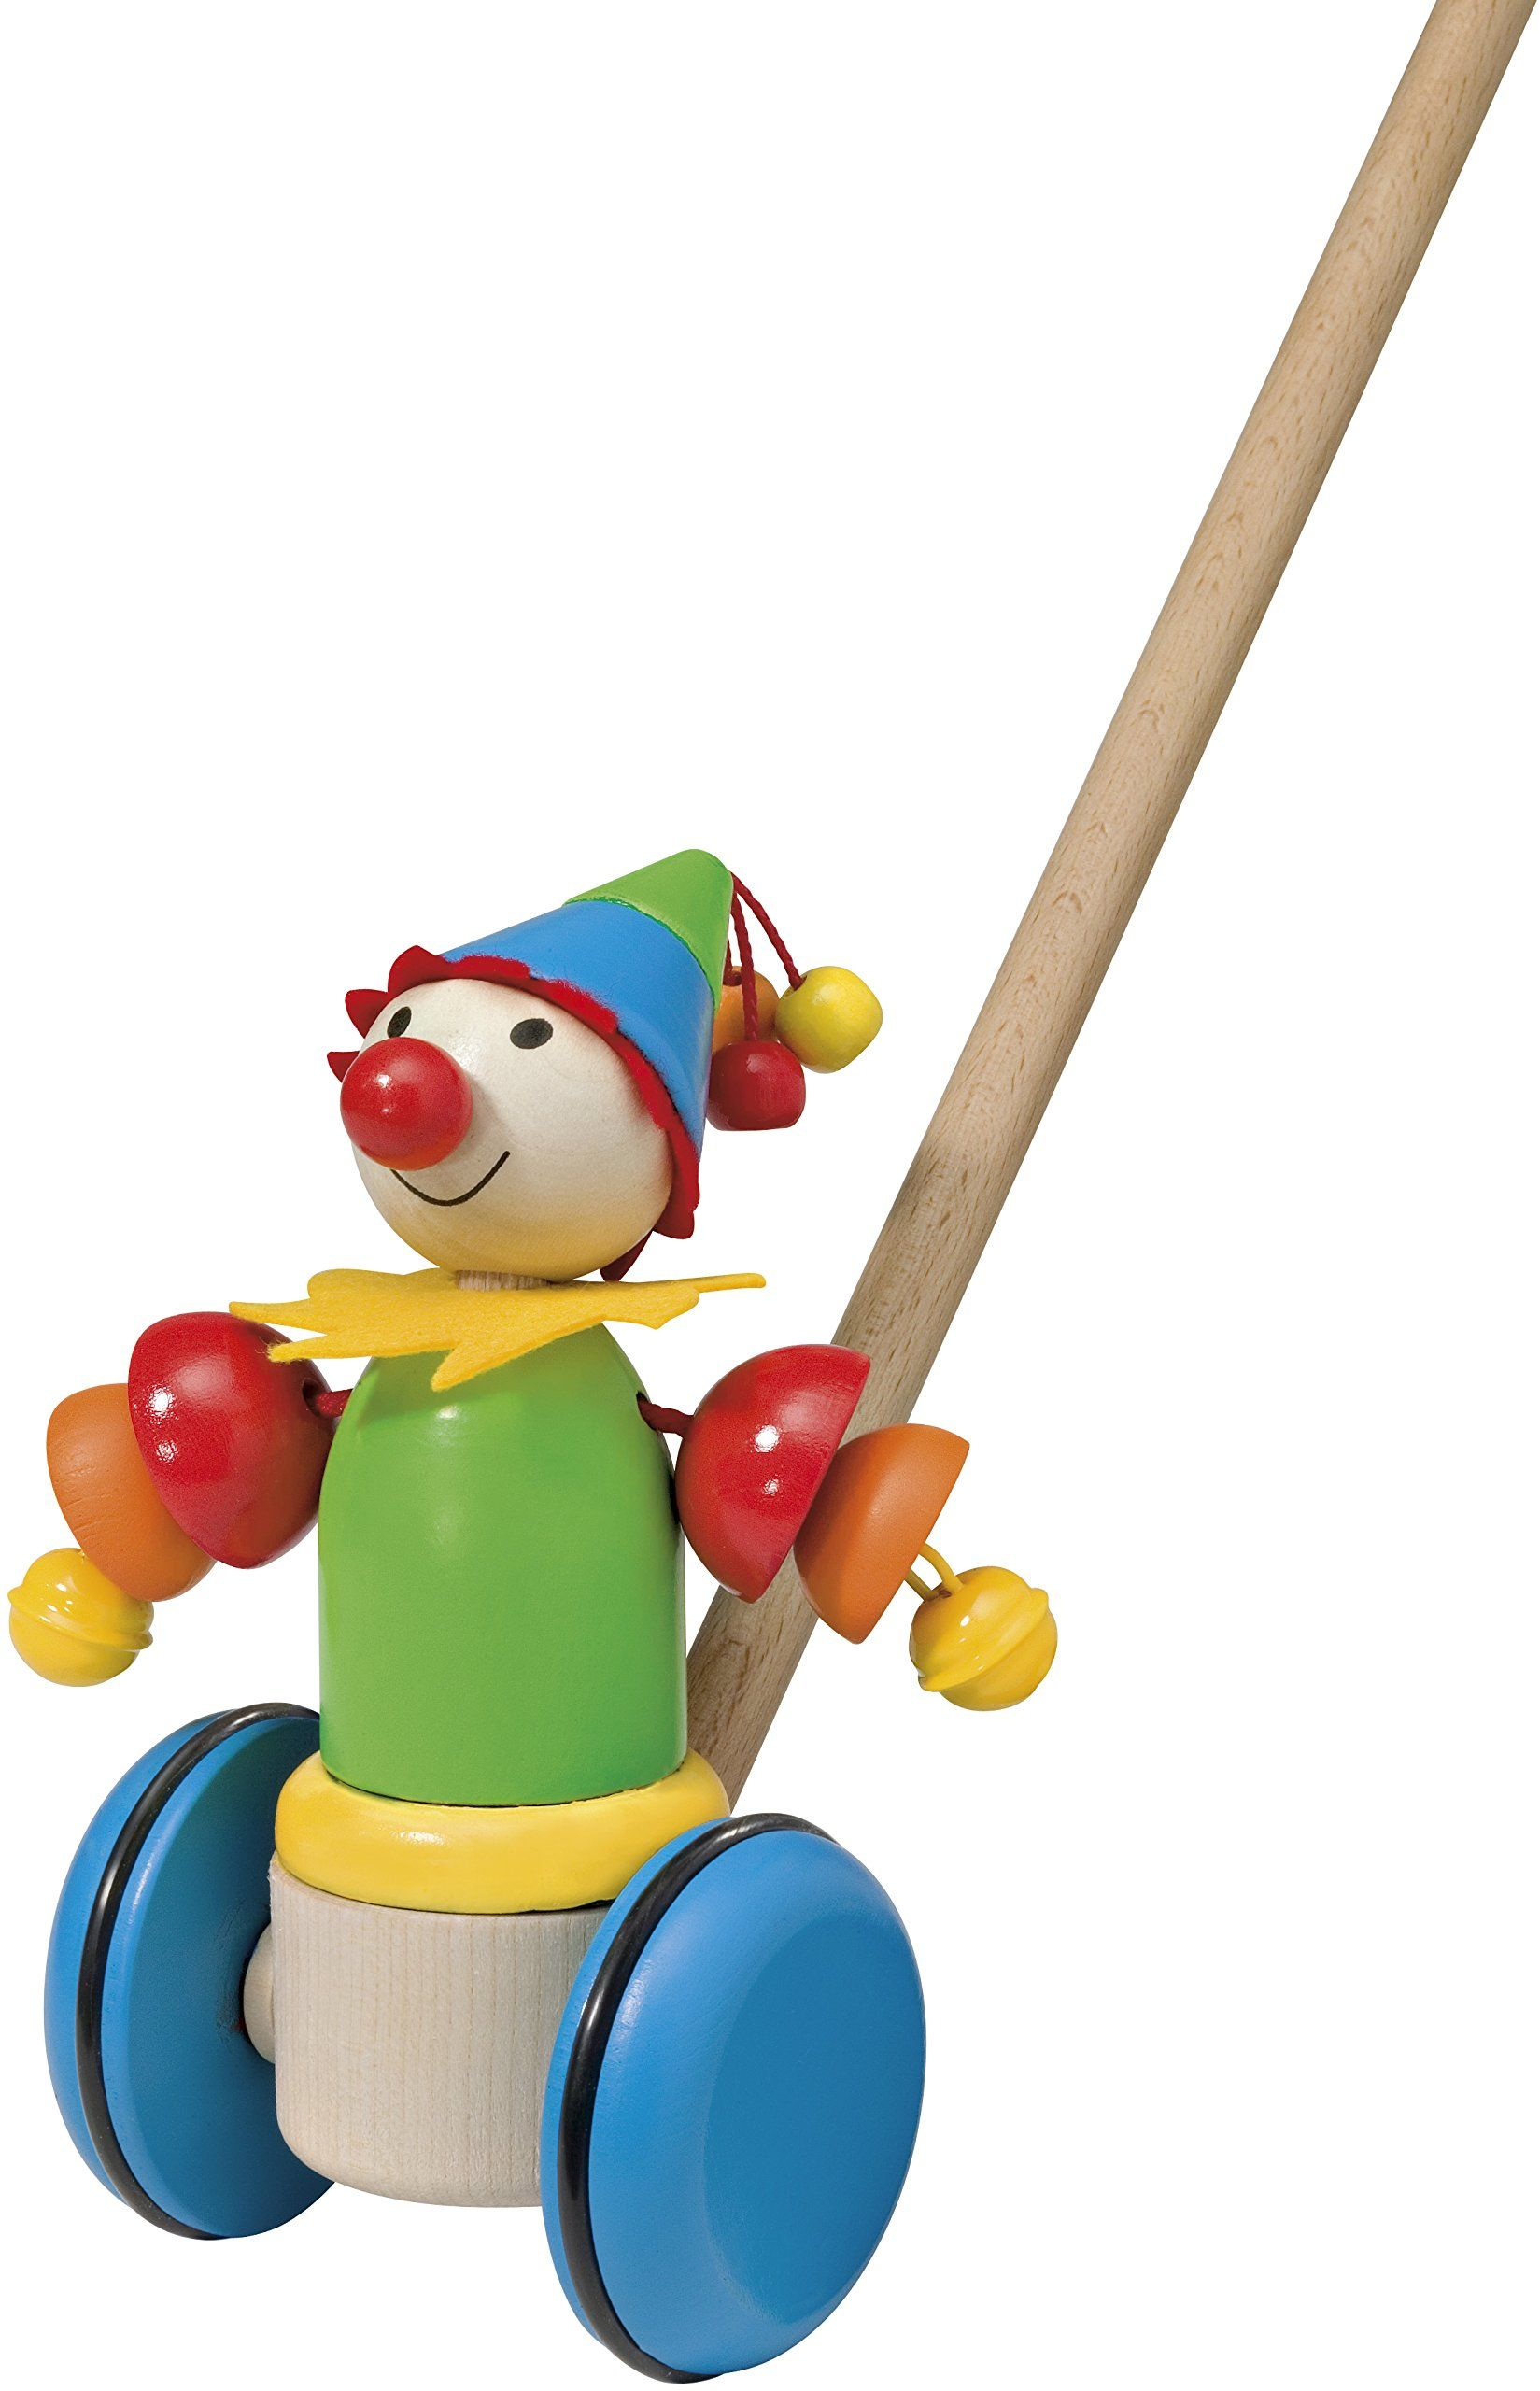 Selecta 62034 Schiebefigur Smillo, drewniana zabawka do pchania, 17 cm